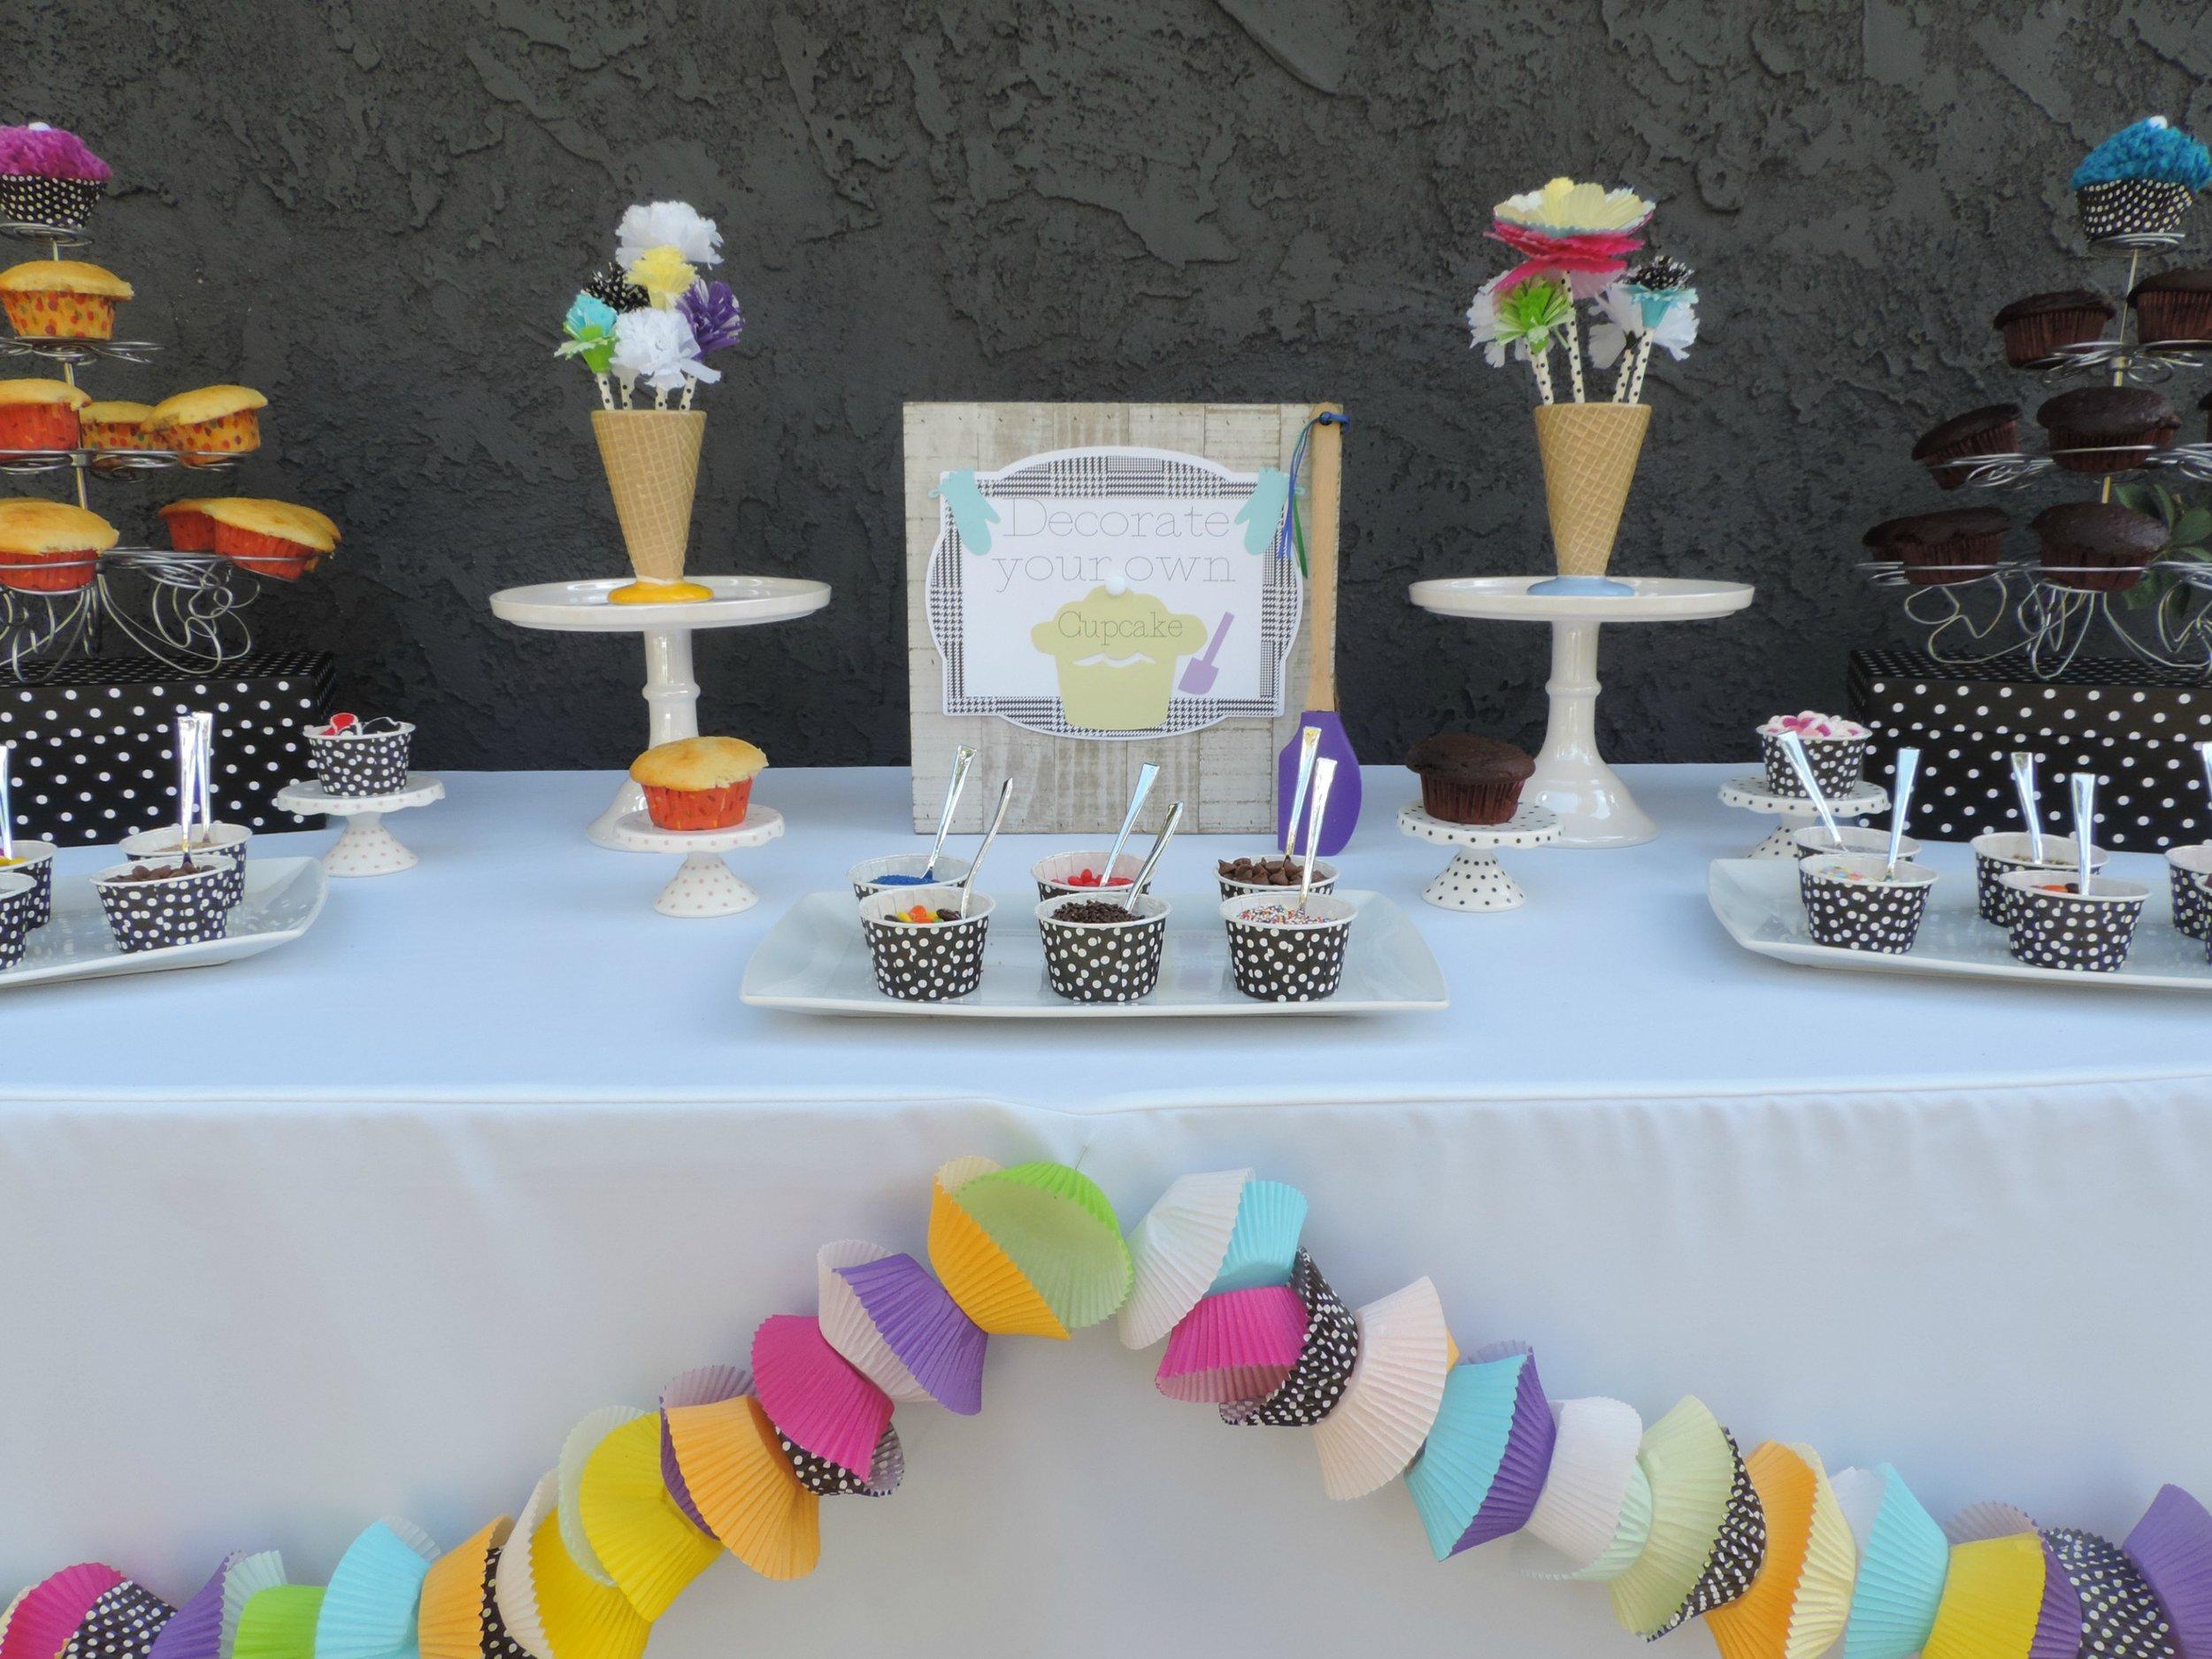 Cupcake wrapper garland-cupcake wars birthday-cupcake decorating party-cupcake party-cupcake party decor-cupcake decorating party ideas-www.SugarPartiesLA.com.jpg